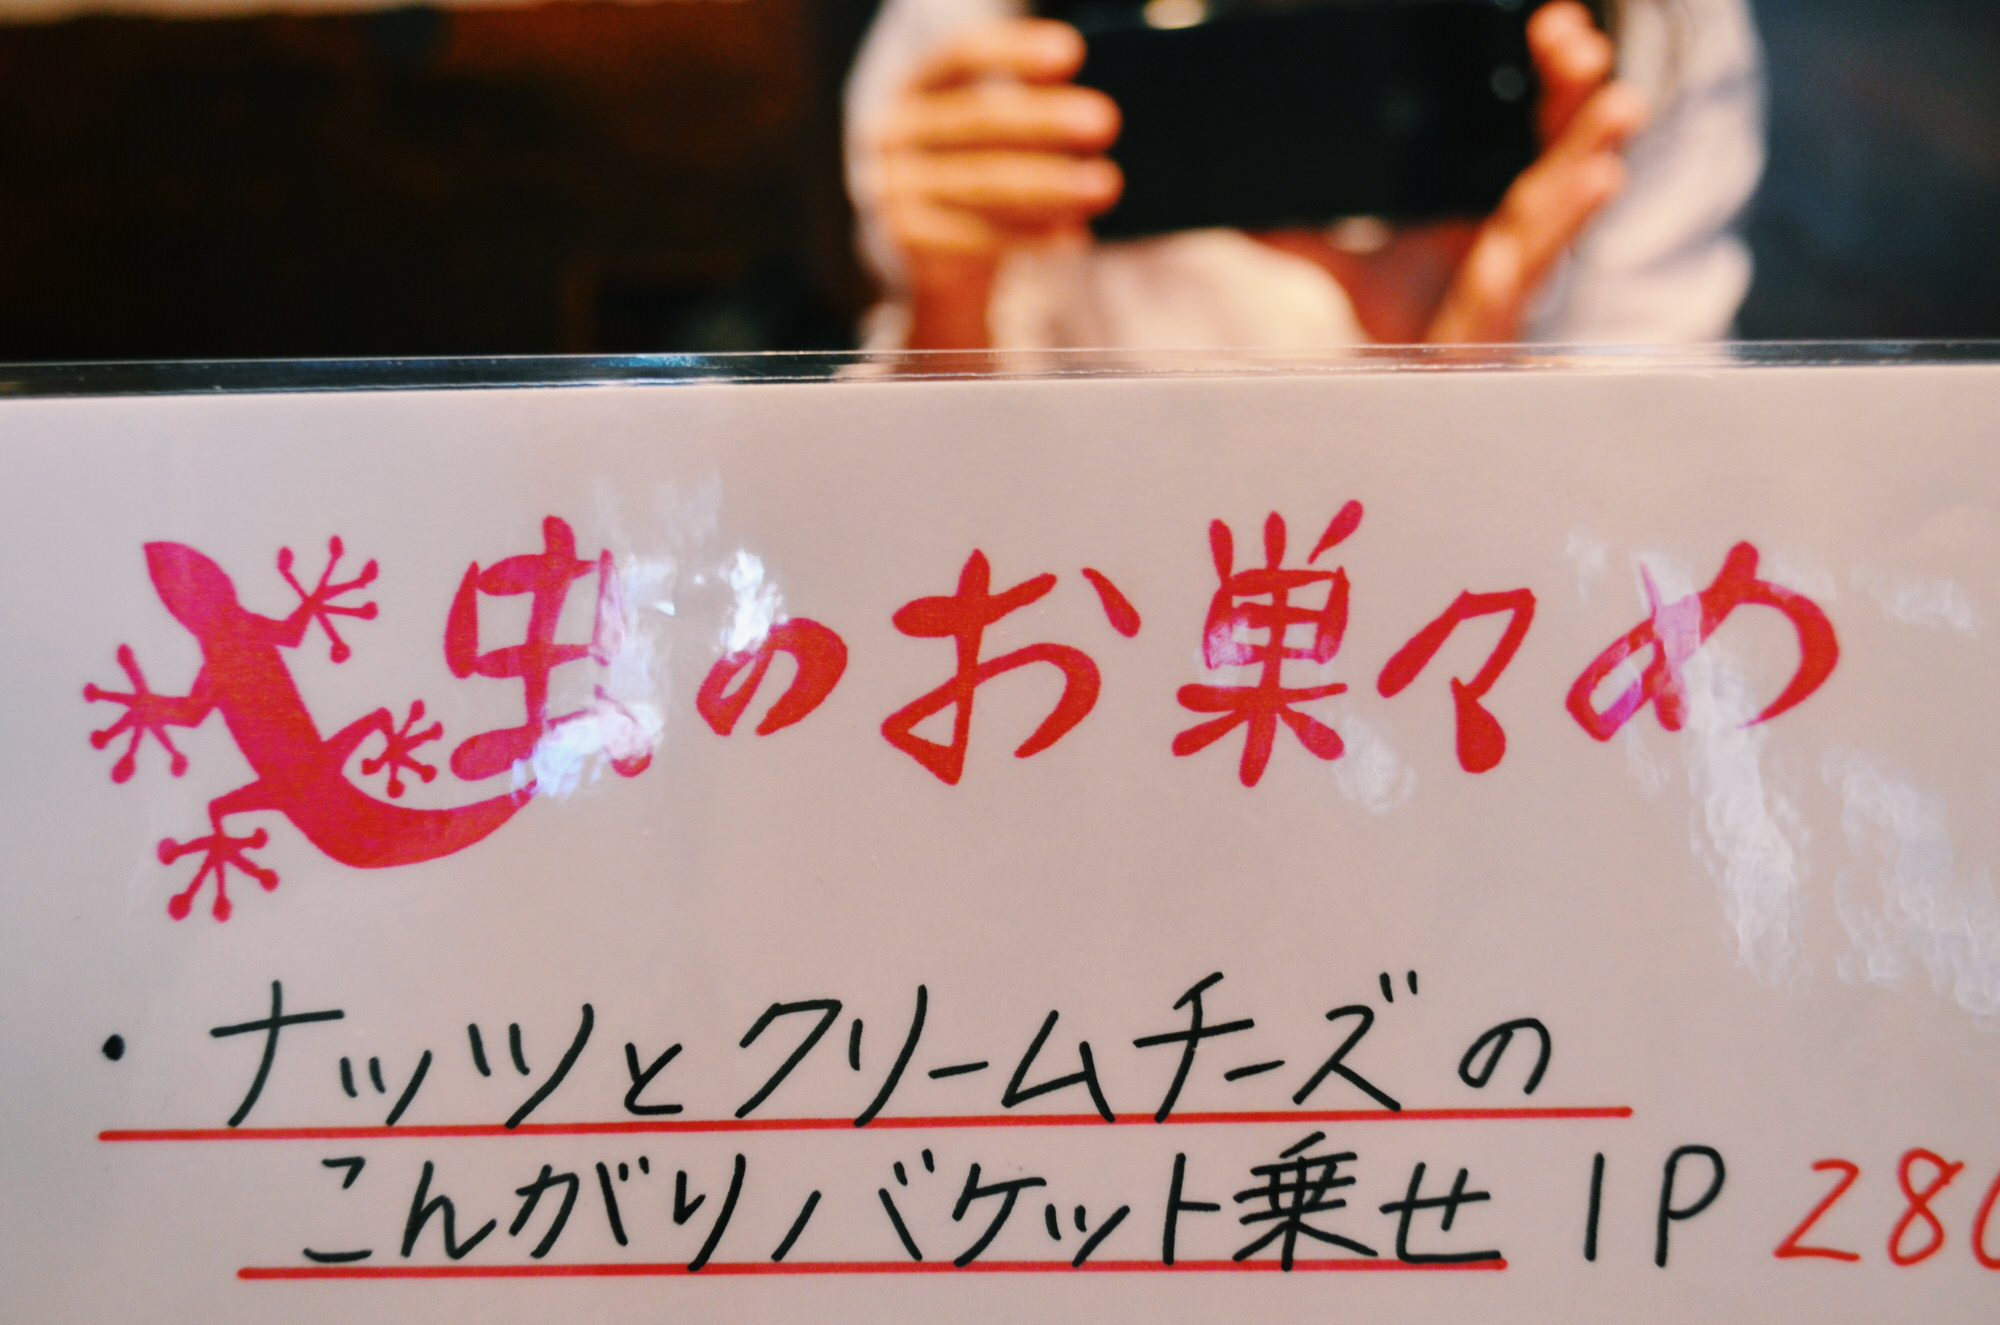 Setagaya photowalk 4